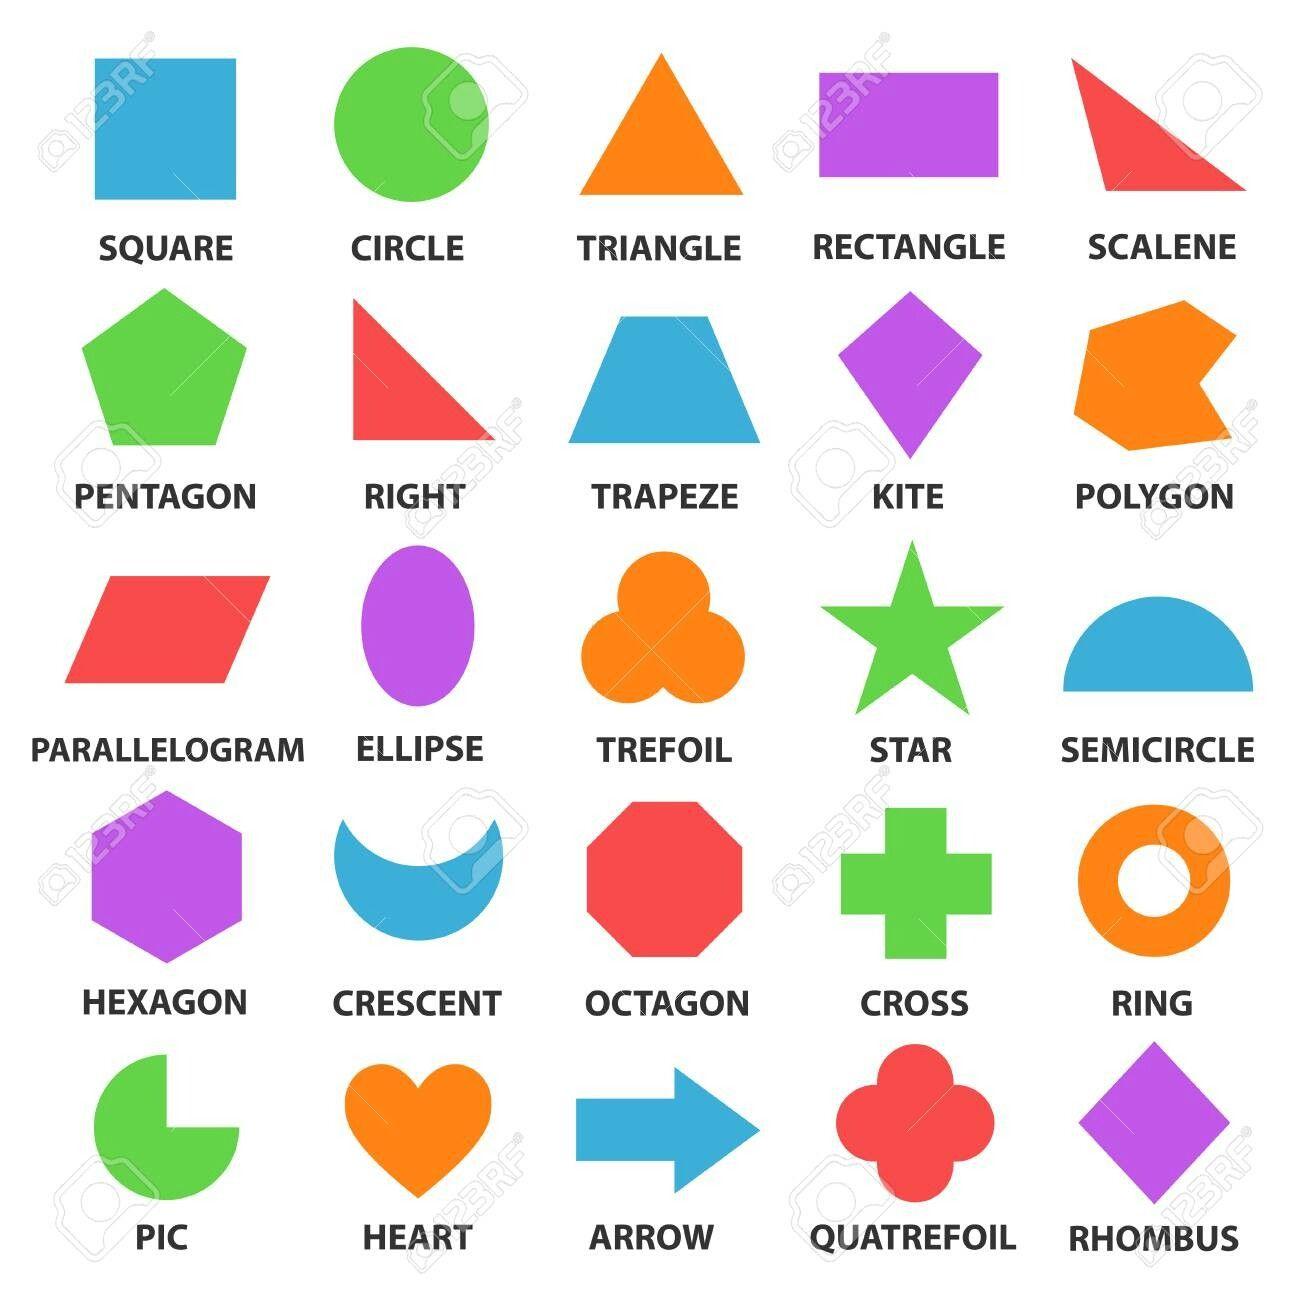 Kinds Of Shapes